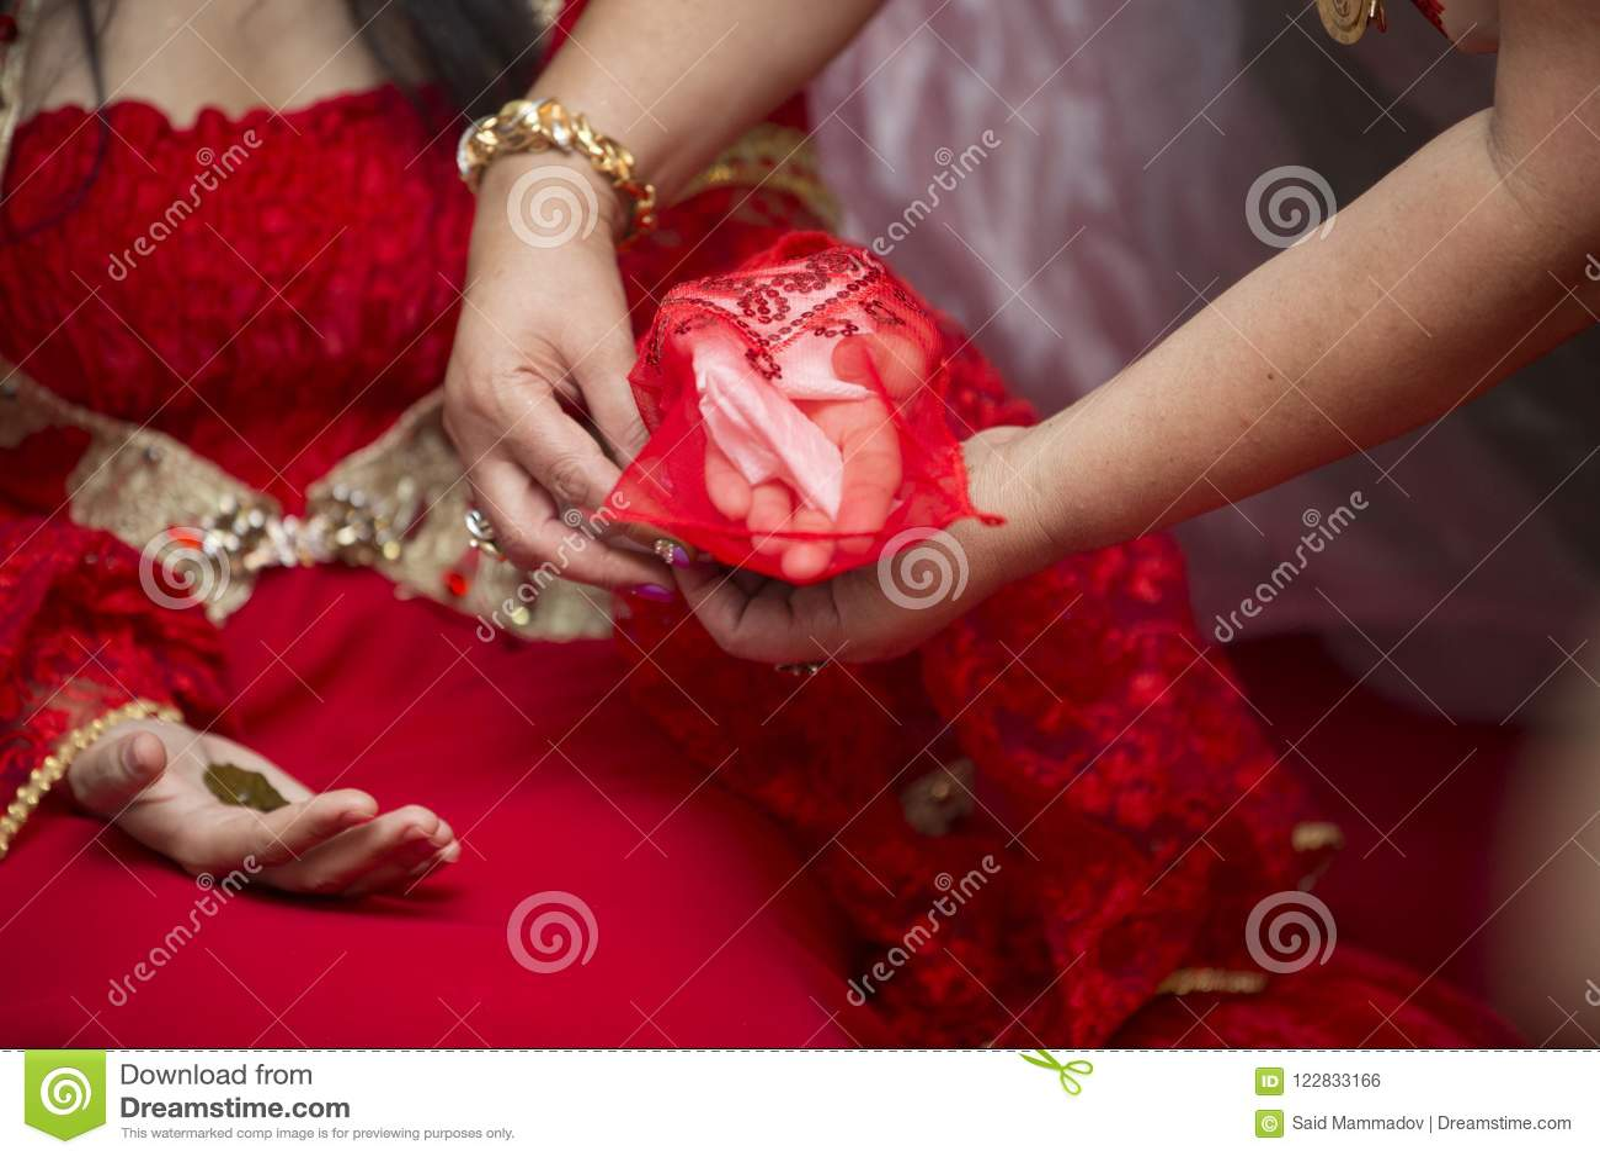 Wedding Dress Wedding Rings Wedding Bouquet Stock Photo Image